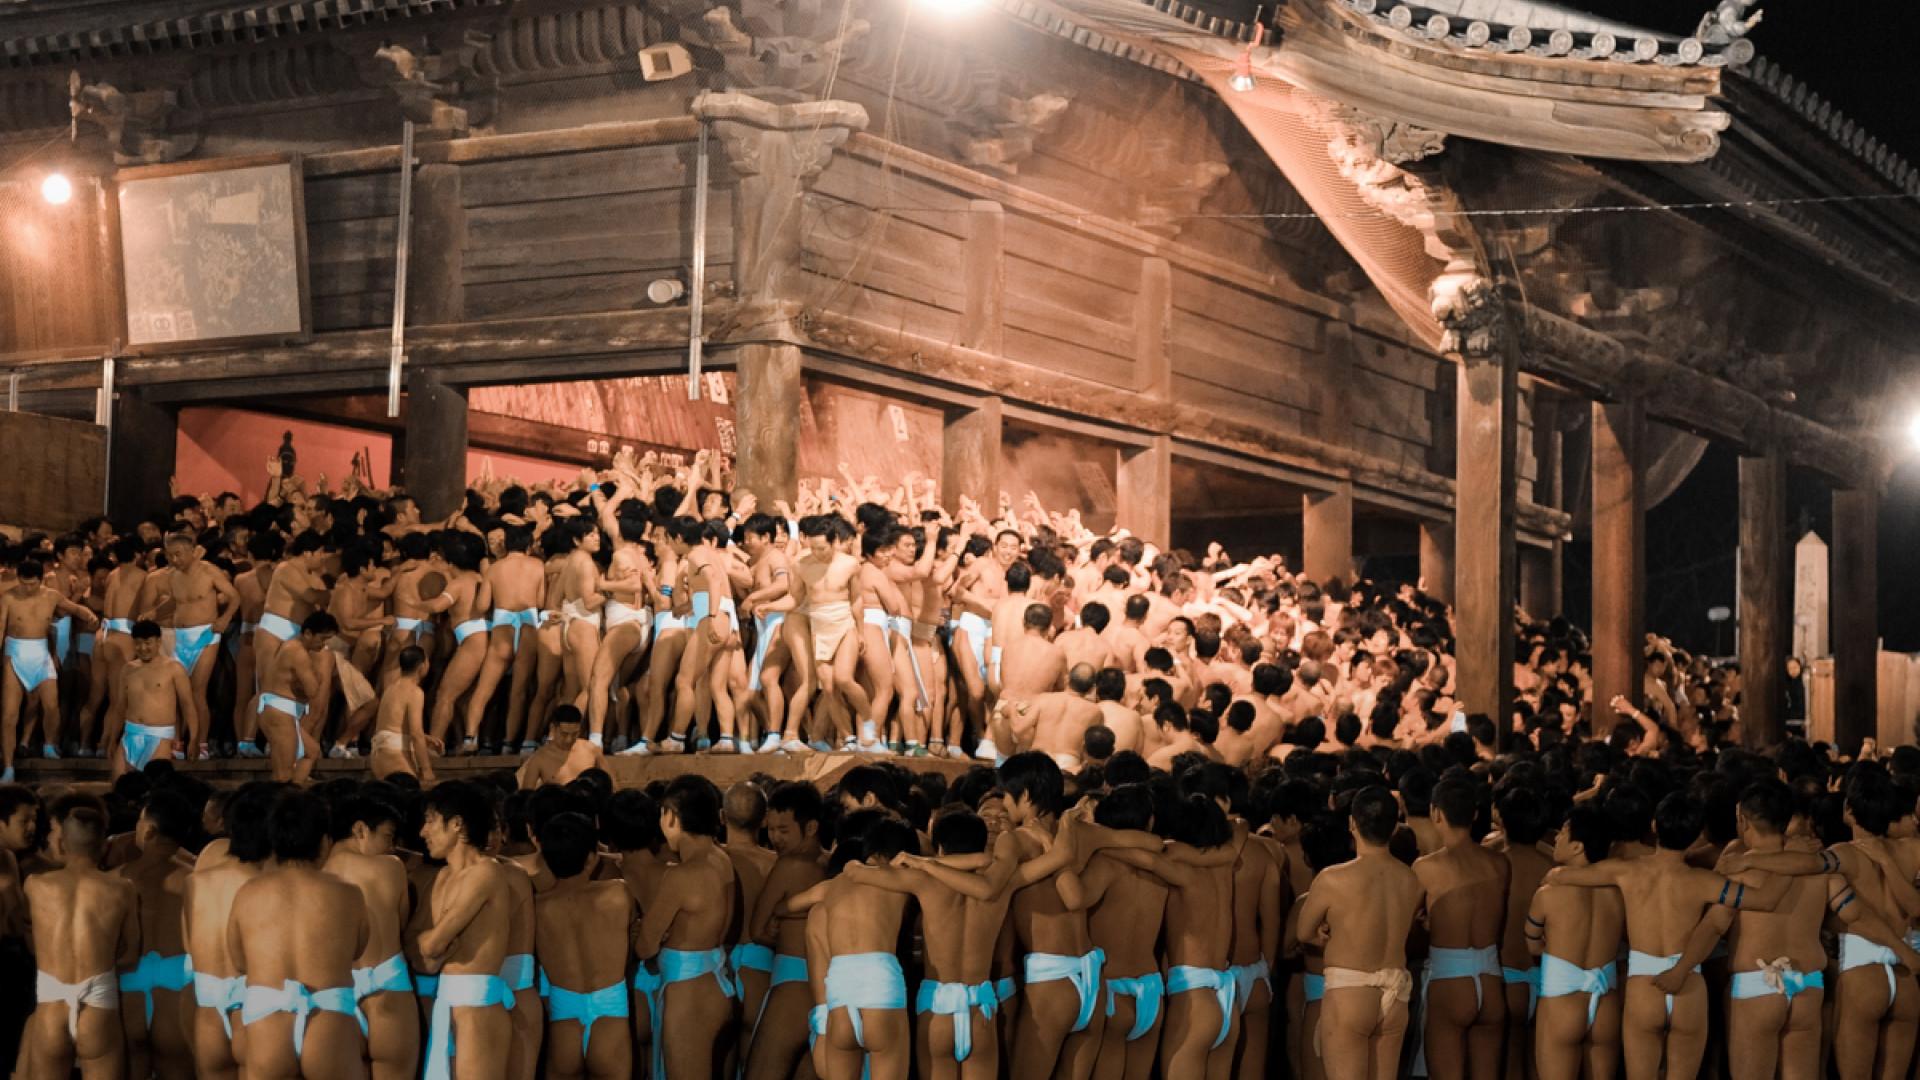 Hadaka_Matsuri_(-Naked_Festival-)_in_Bitchu_Kokubunji_temple._Okayama,_Okayama_Prefecture,_Chūgoku_region,_Japan